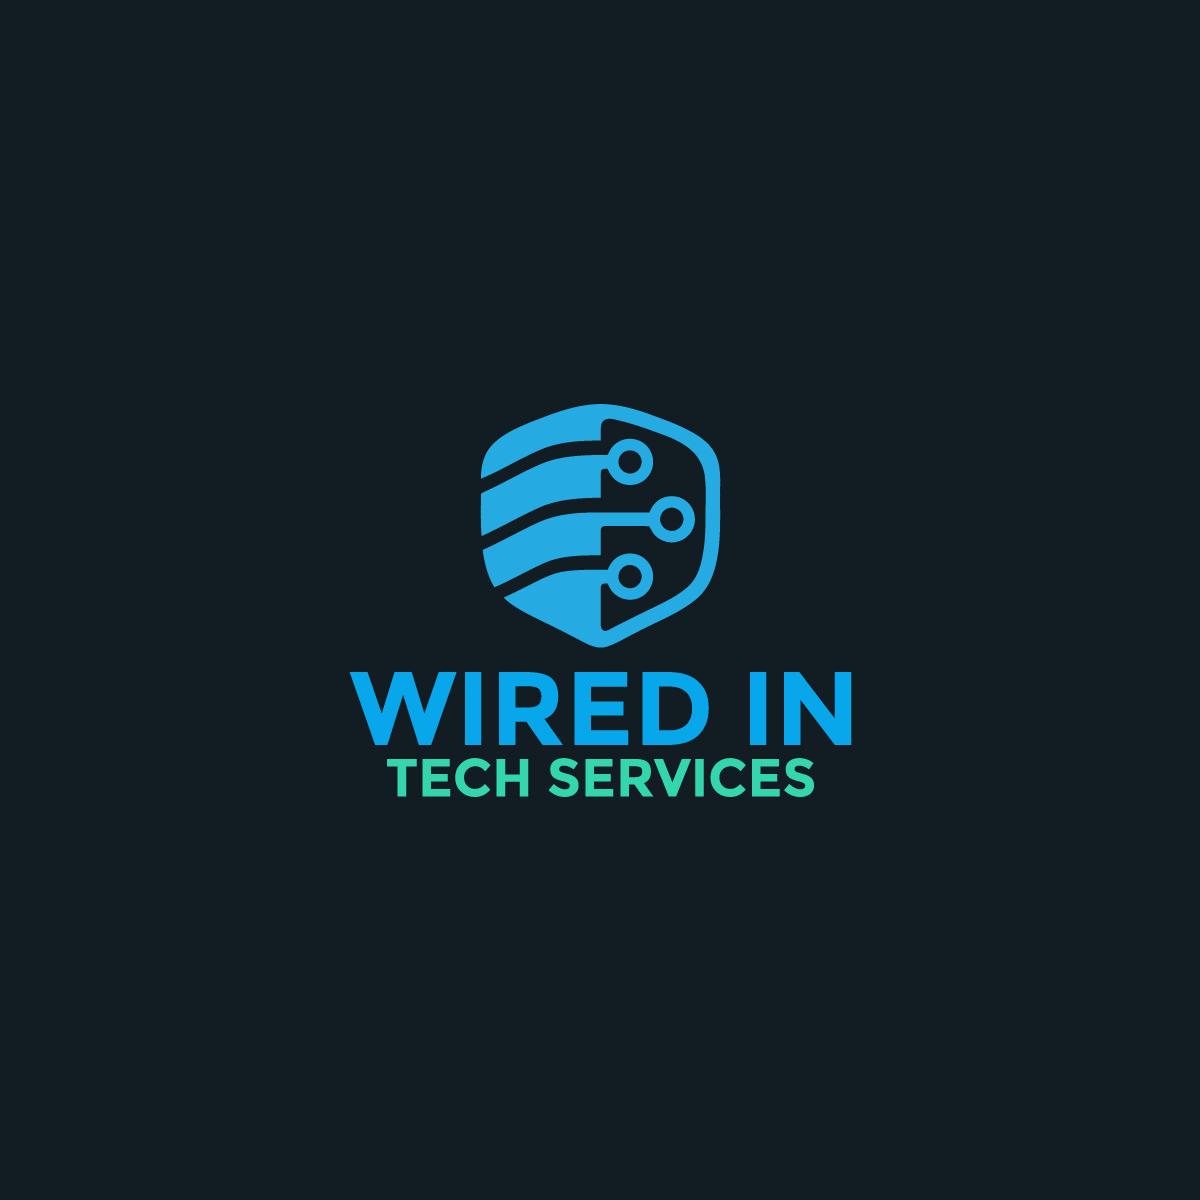 Wired INN